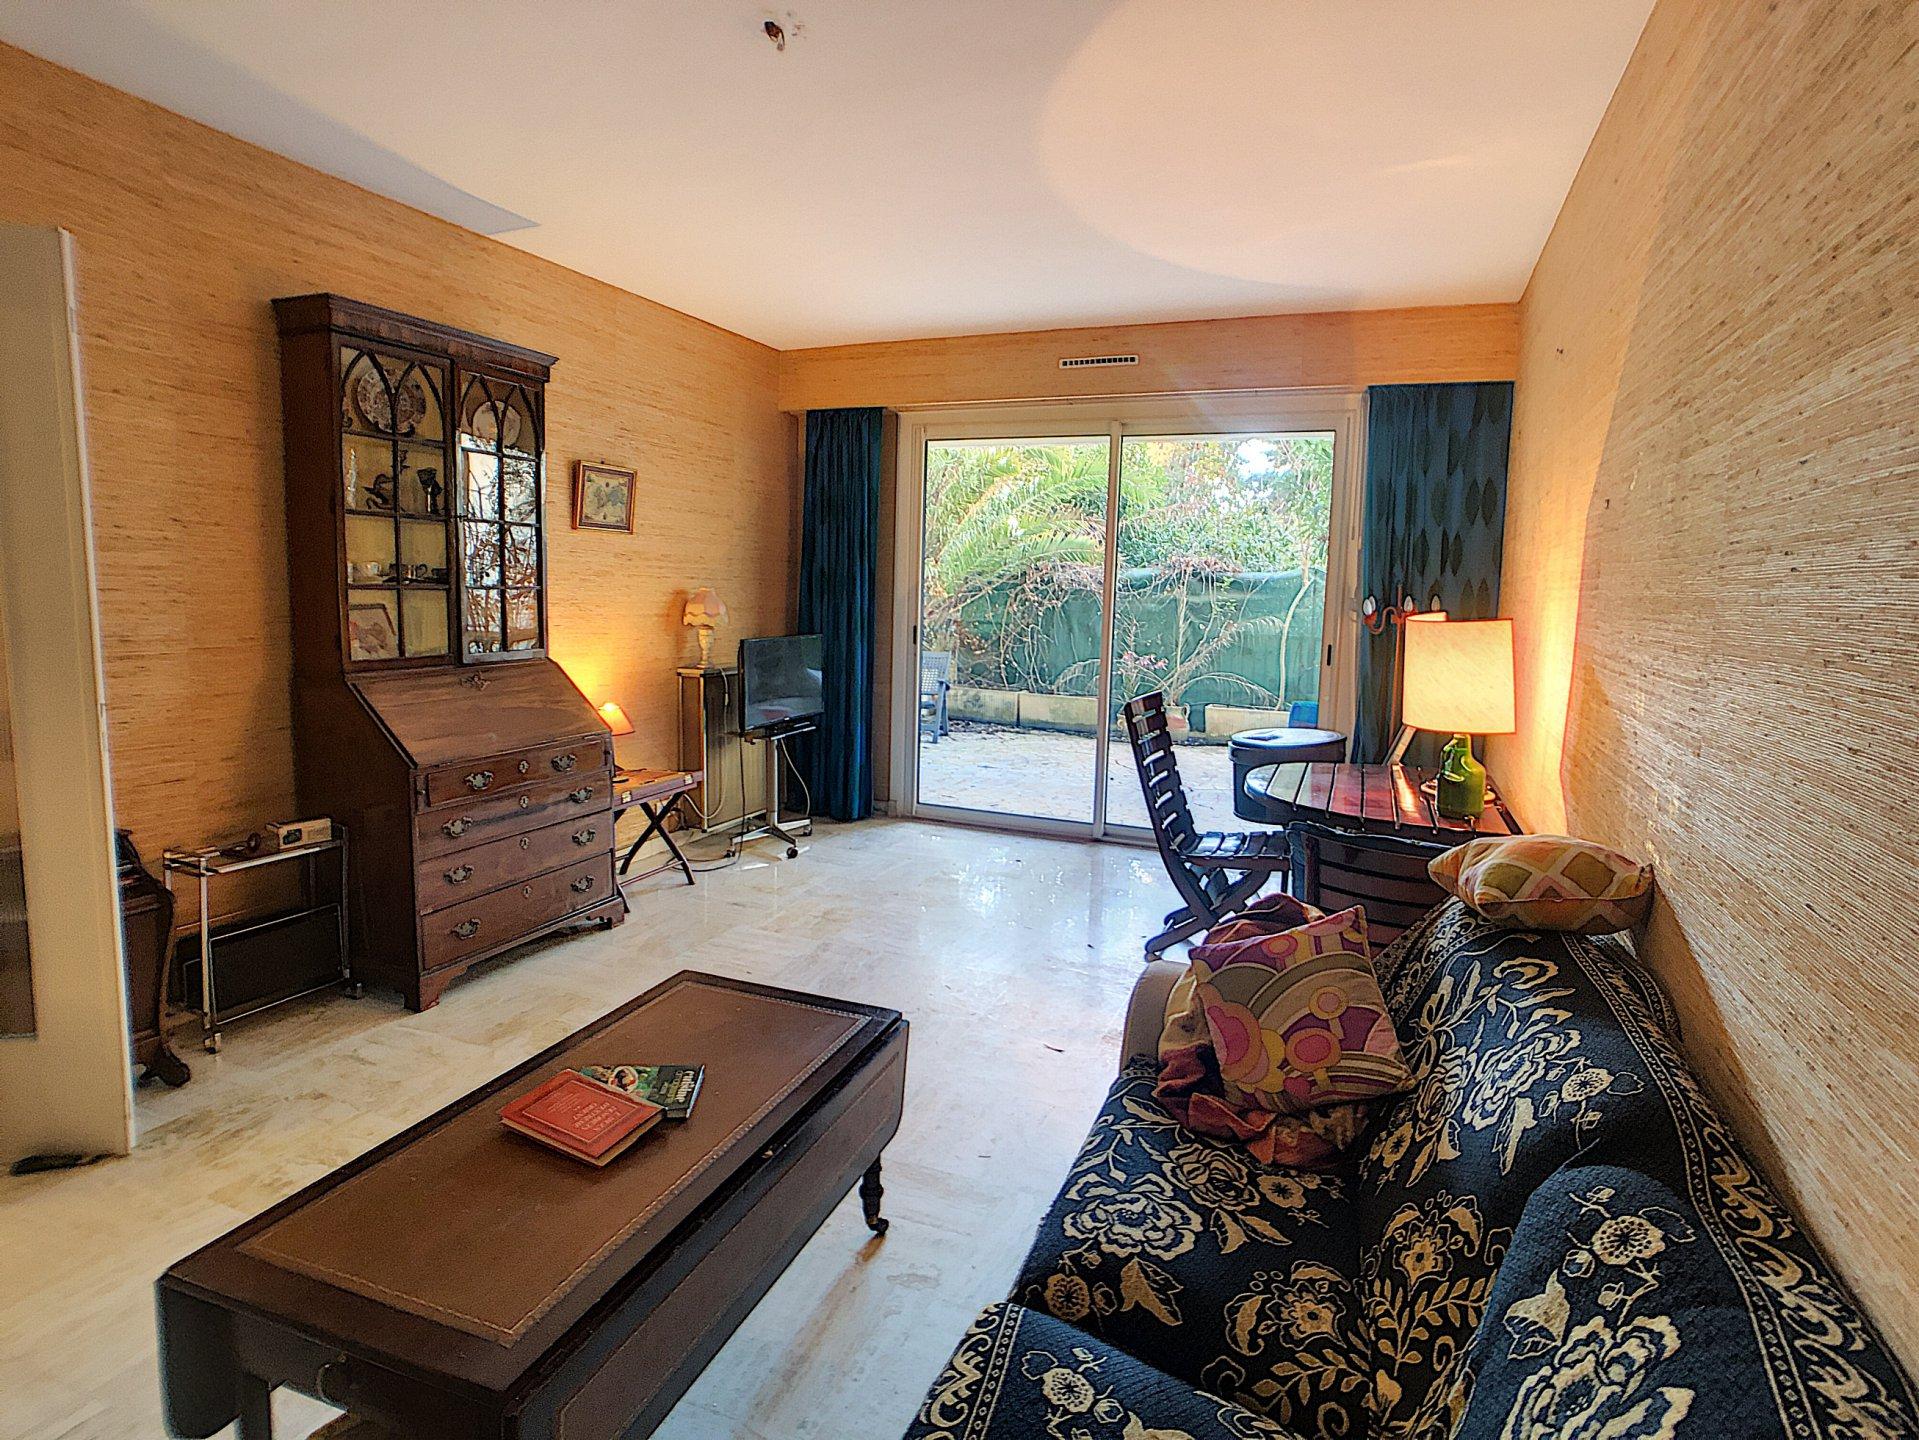 Apartment of 96 m² near beaches